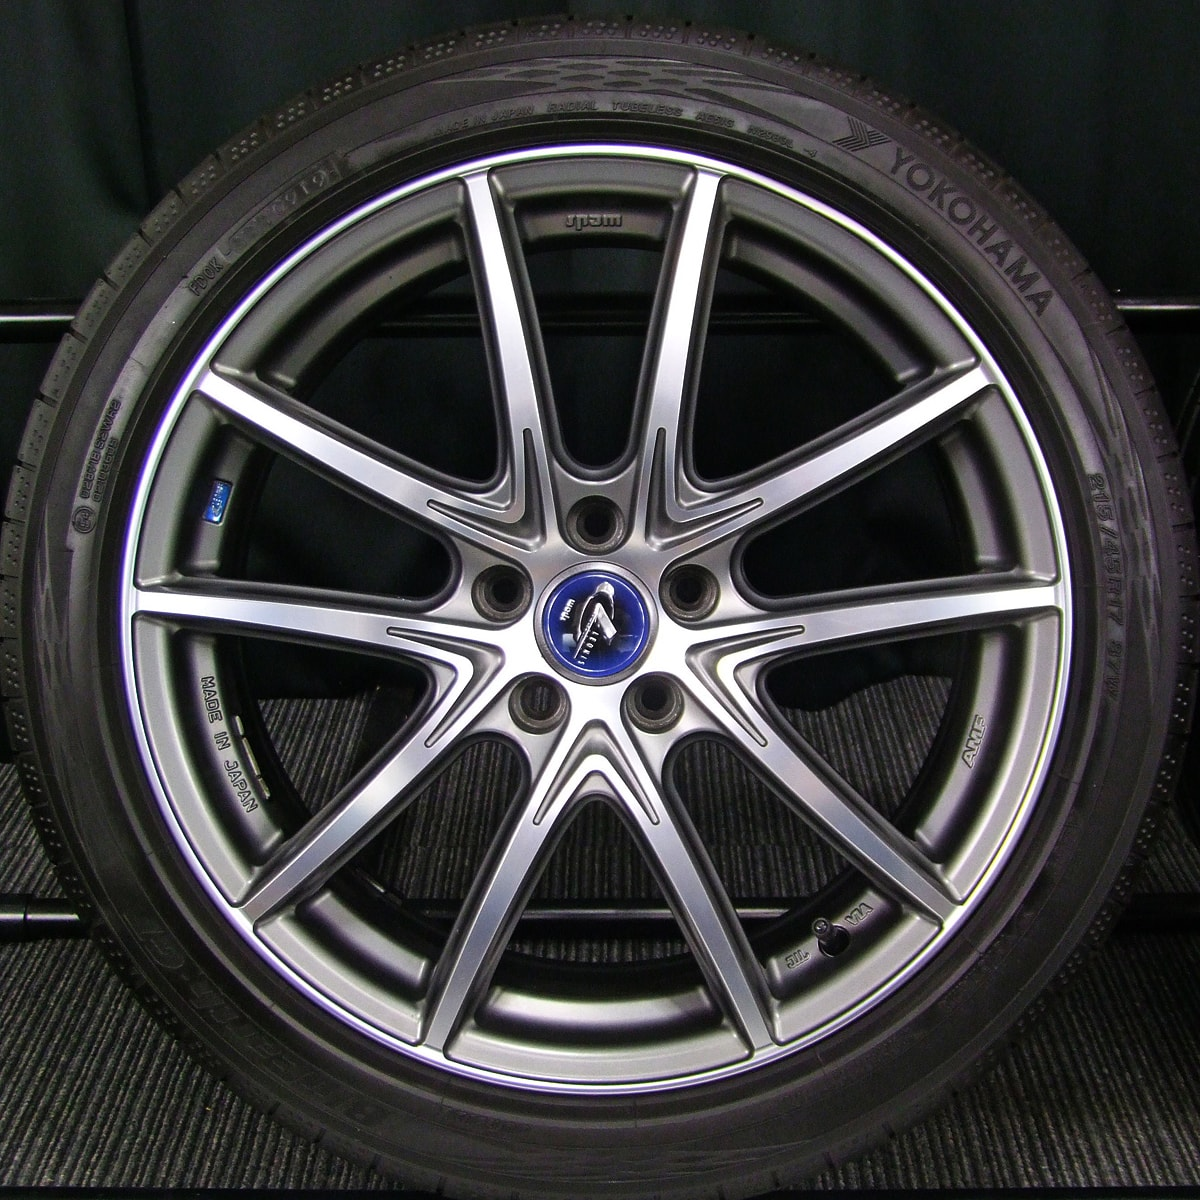 WEDS LEONIS NAVIA 01 マットガンメタ&マシニングカット YOKOHAMA BluEarth-GT AE51 215/45R17 4本SET